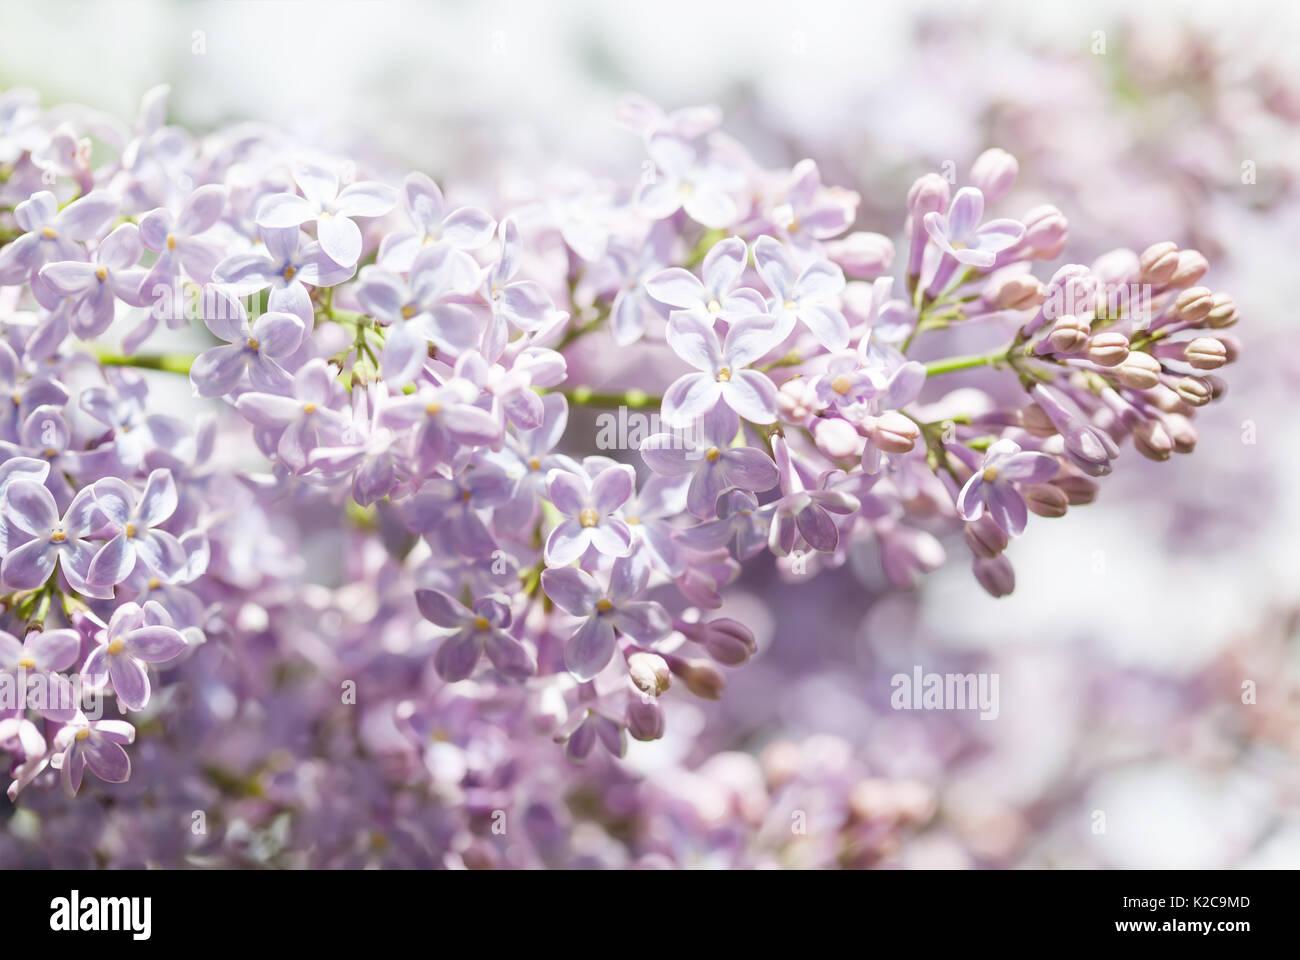 Pink Flowers Spring Background Lilac Bush Closeup Soft Focus Stock